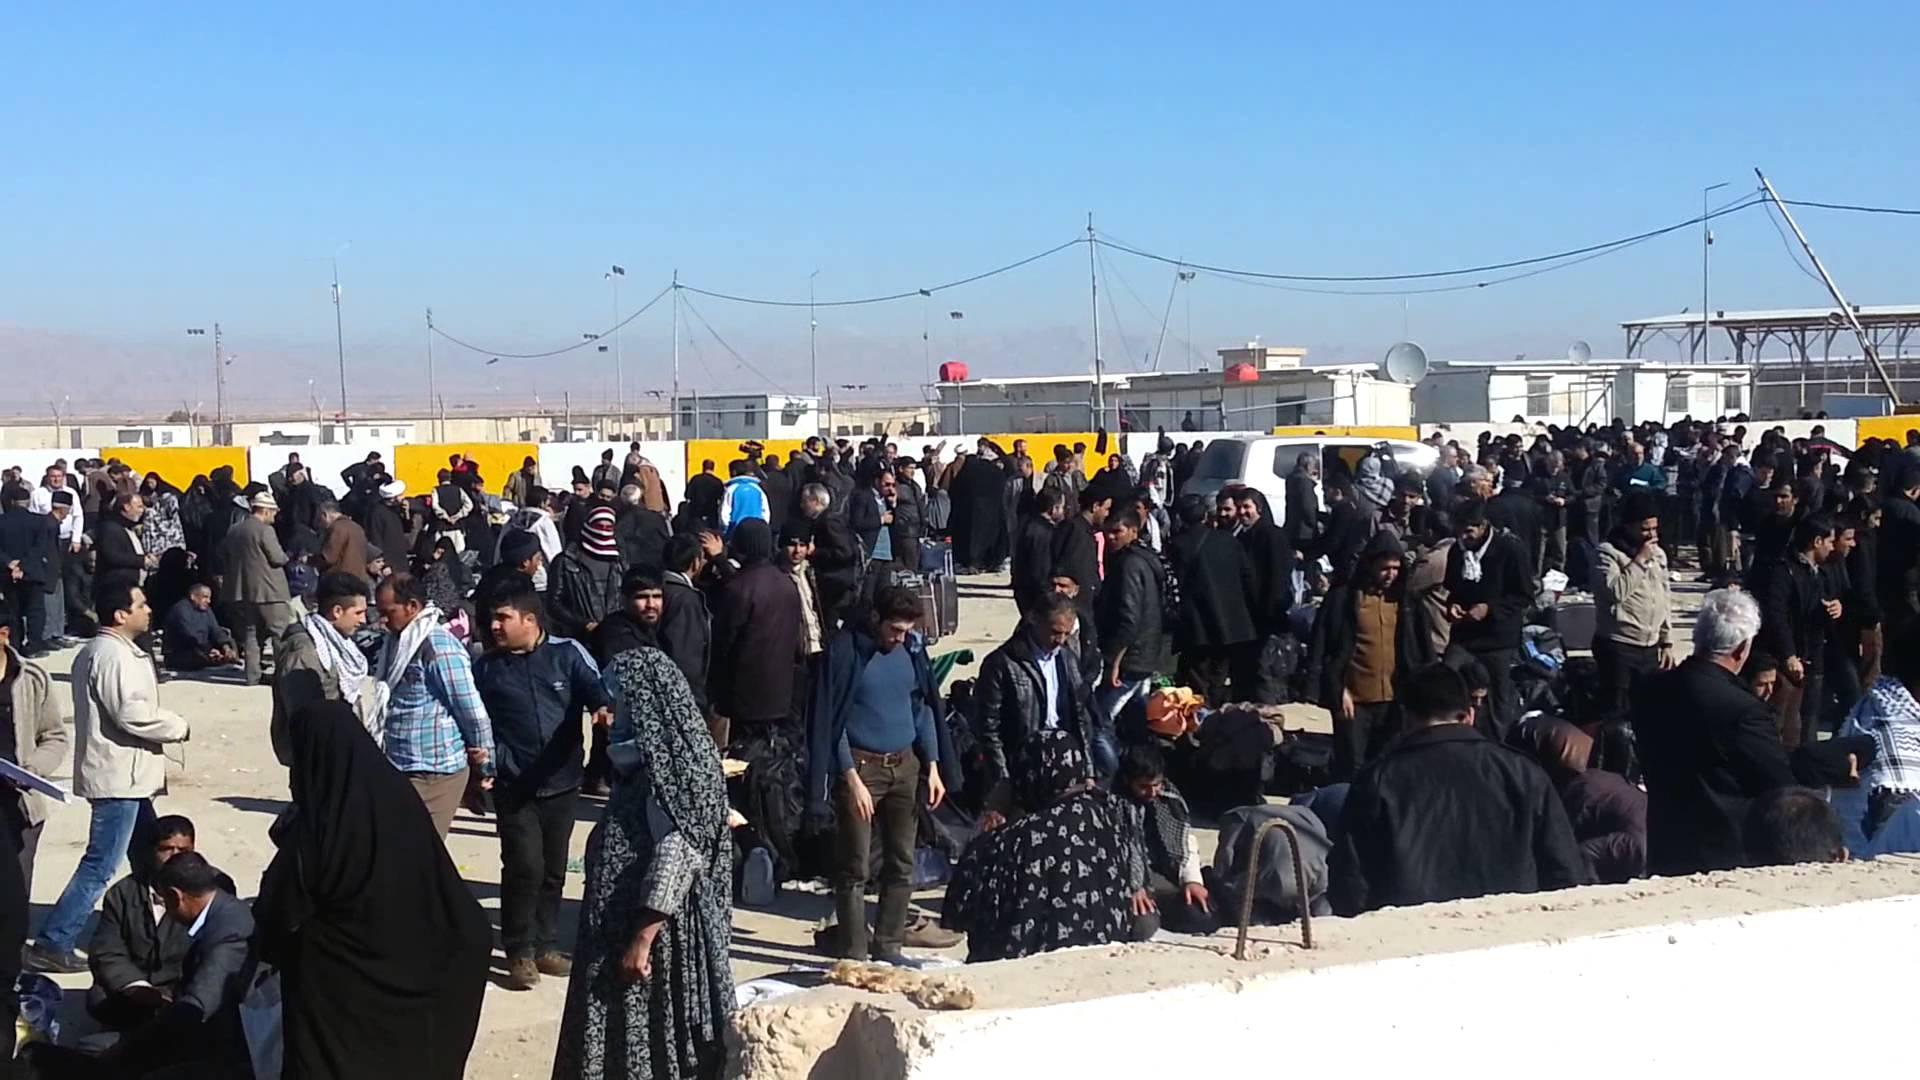 ئيلام باس له هاتن 500 ههزار زيارهتكار رووژانهى ئيرانى ئهرا عراق ئهكا